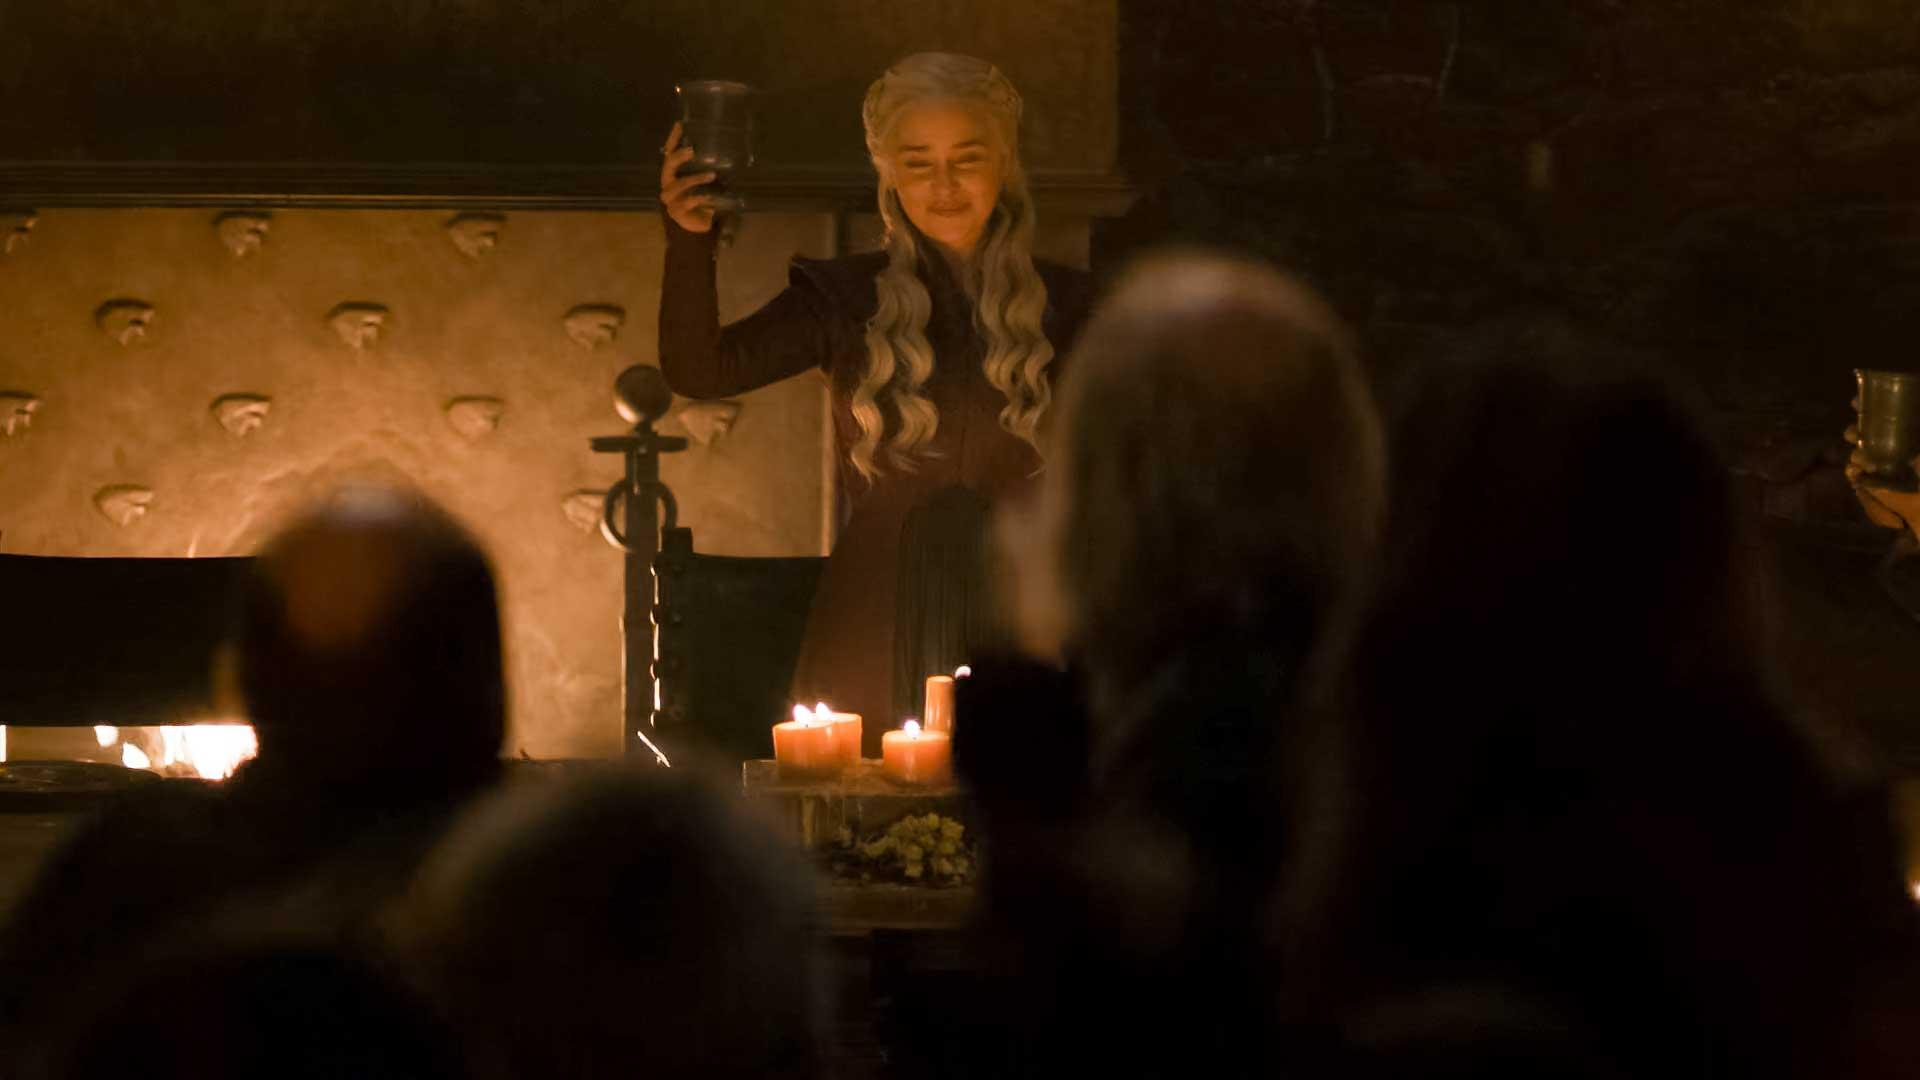 تصاویر قسمت ۴ فصل ۸ گیم آف ترونز (Game Of Thrones)